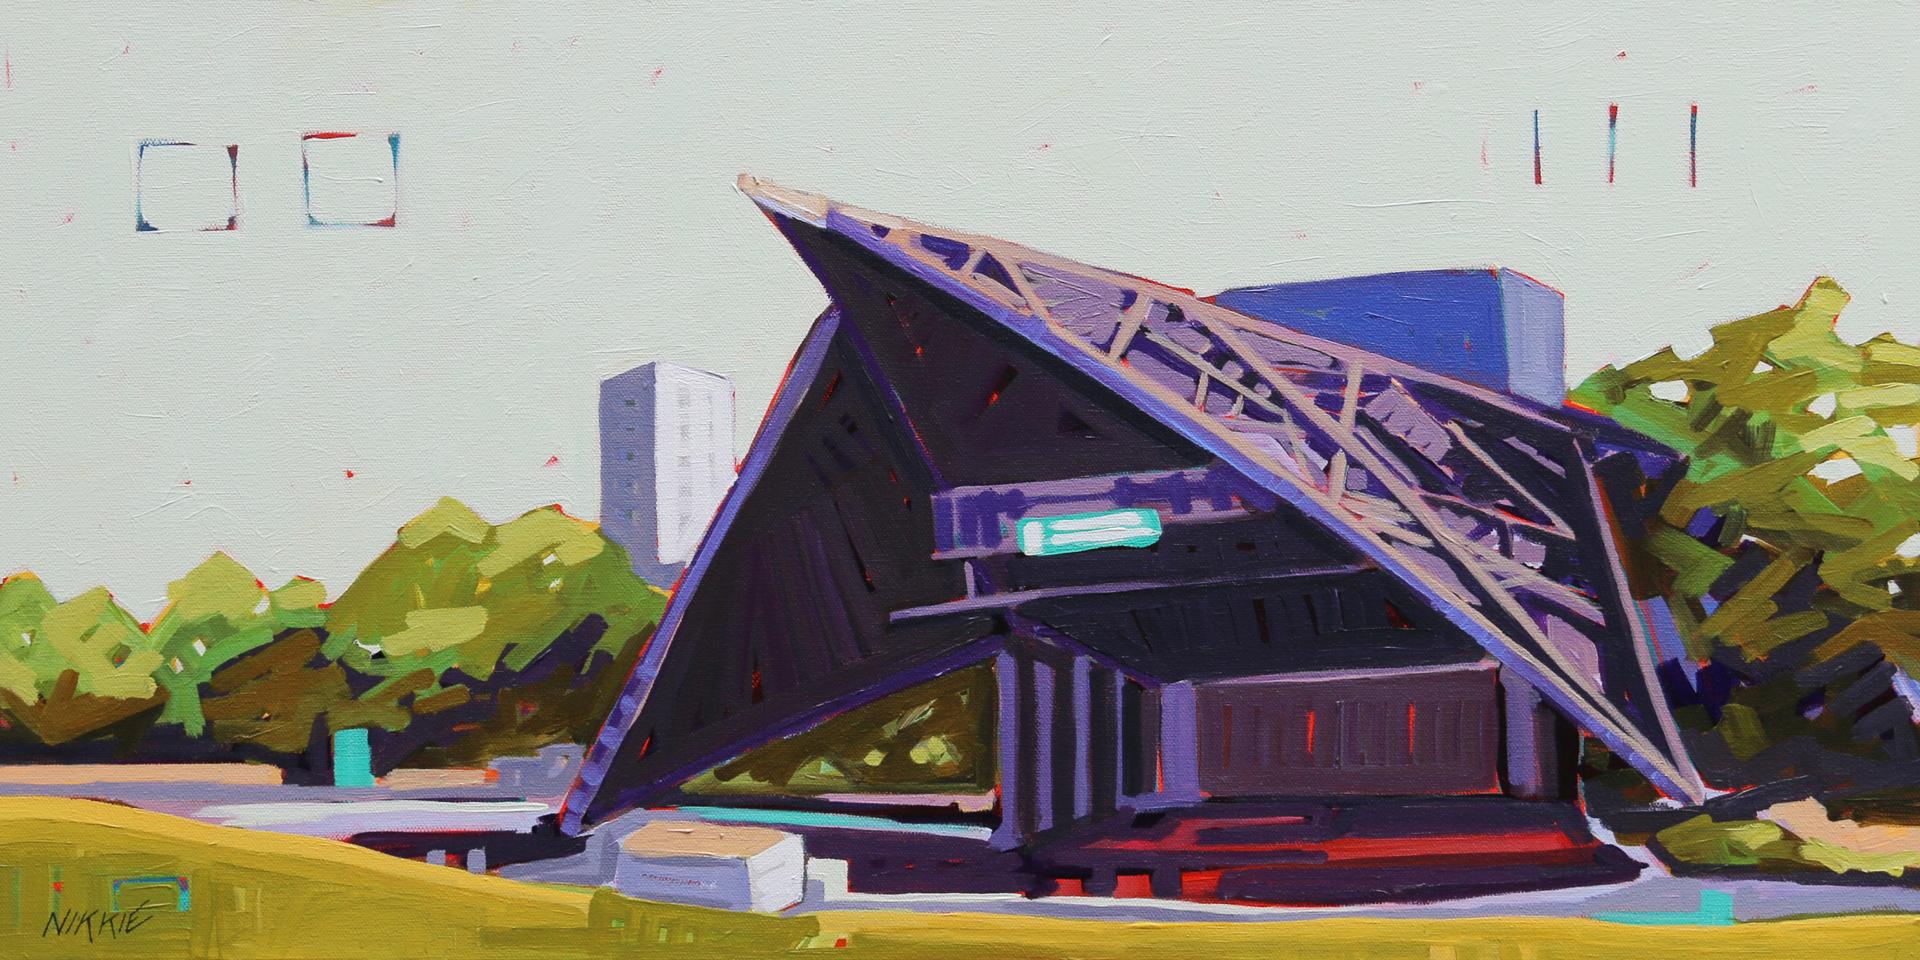 Miller Park Theater by Nikkie Markle